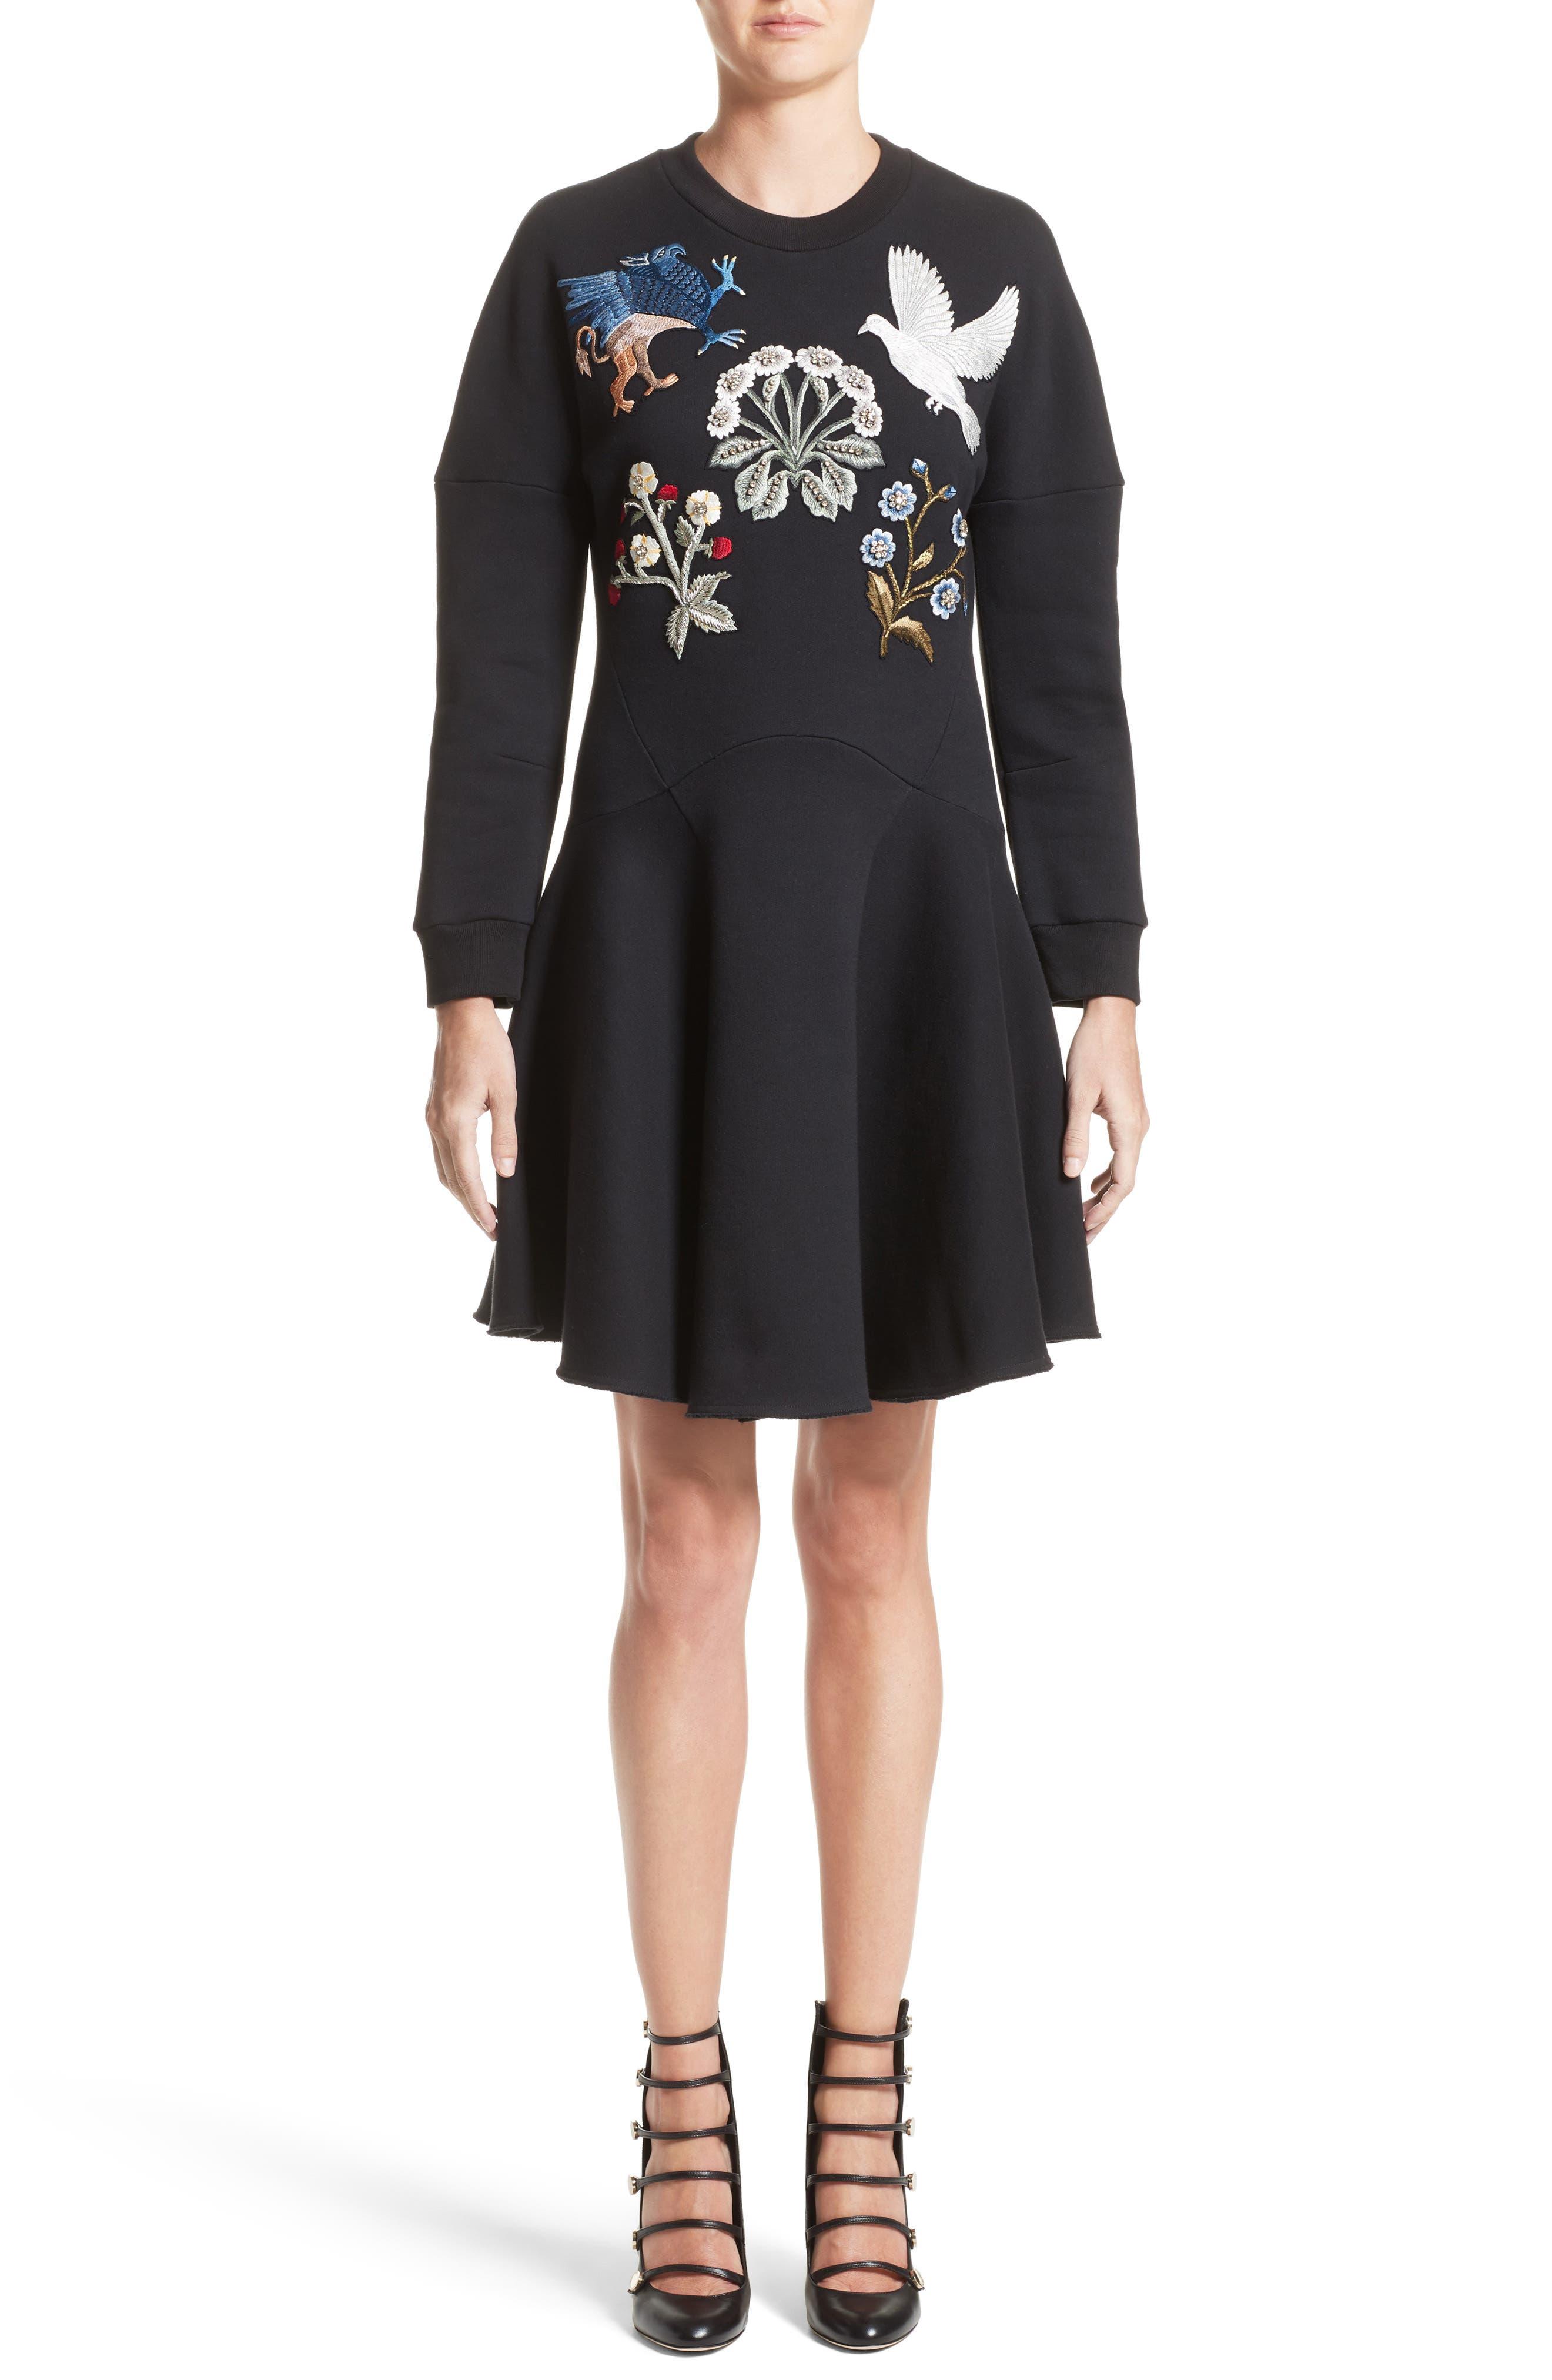 Main Image - Alexander McQueen Embroidered Sweatshirt Dress